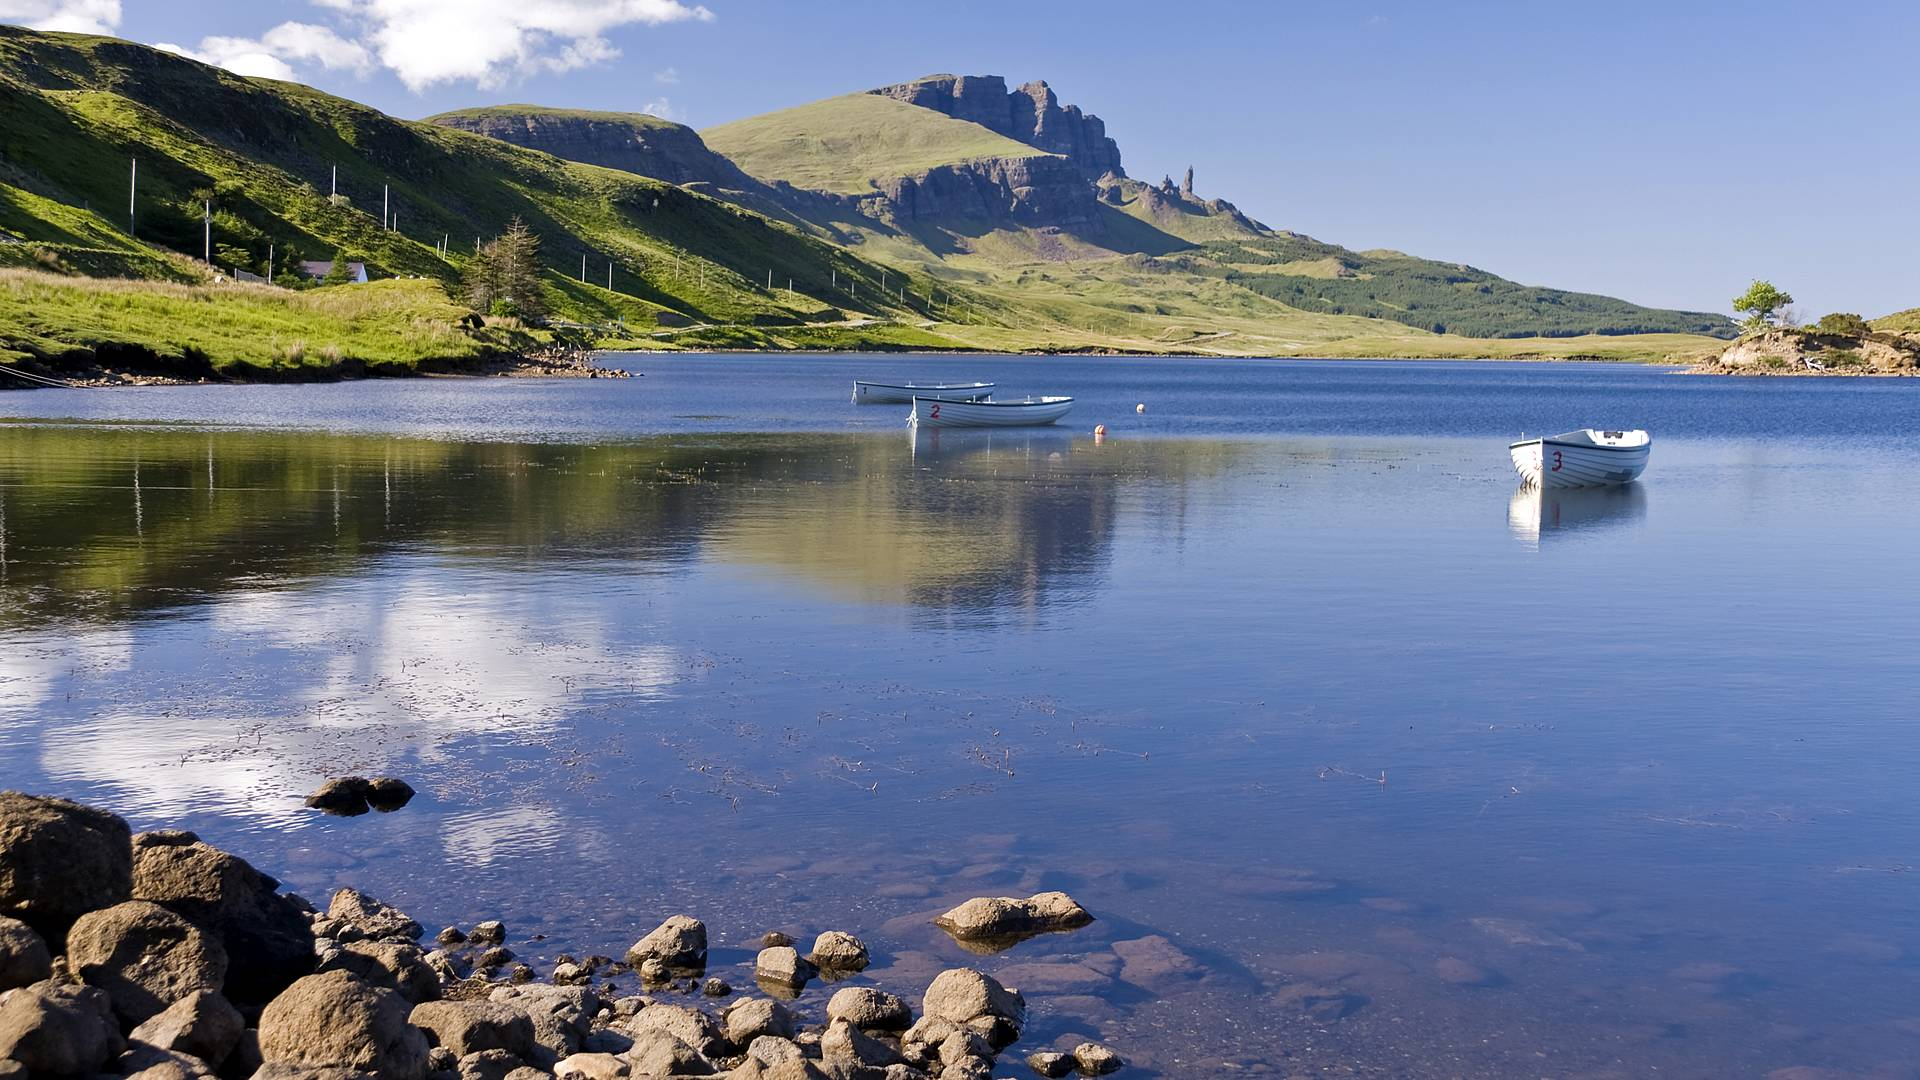 Tra i laghi scozzesi e Outlander